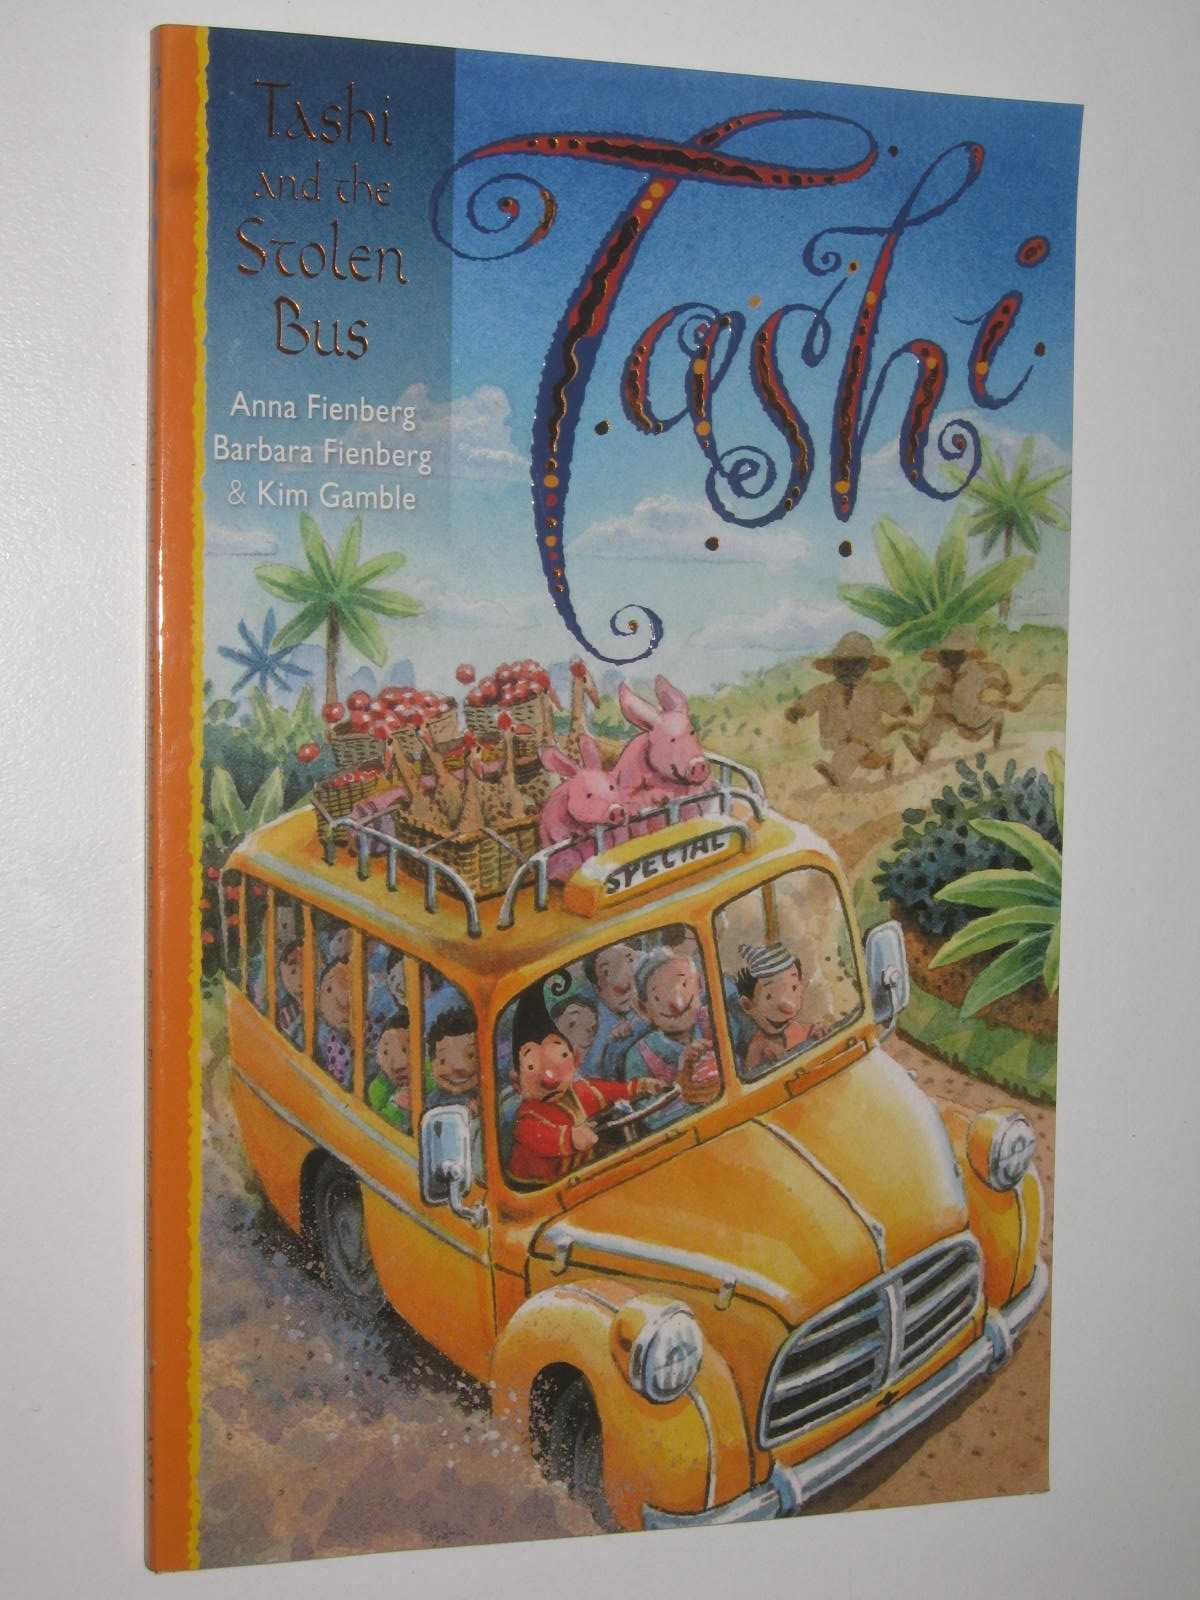 Image for Tashi and the Stolen Bus - Tashi Series #13